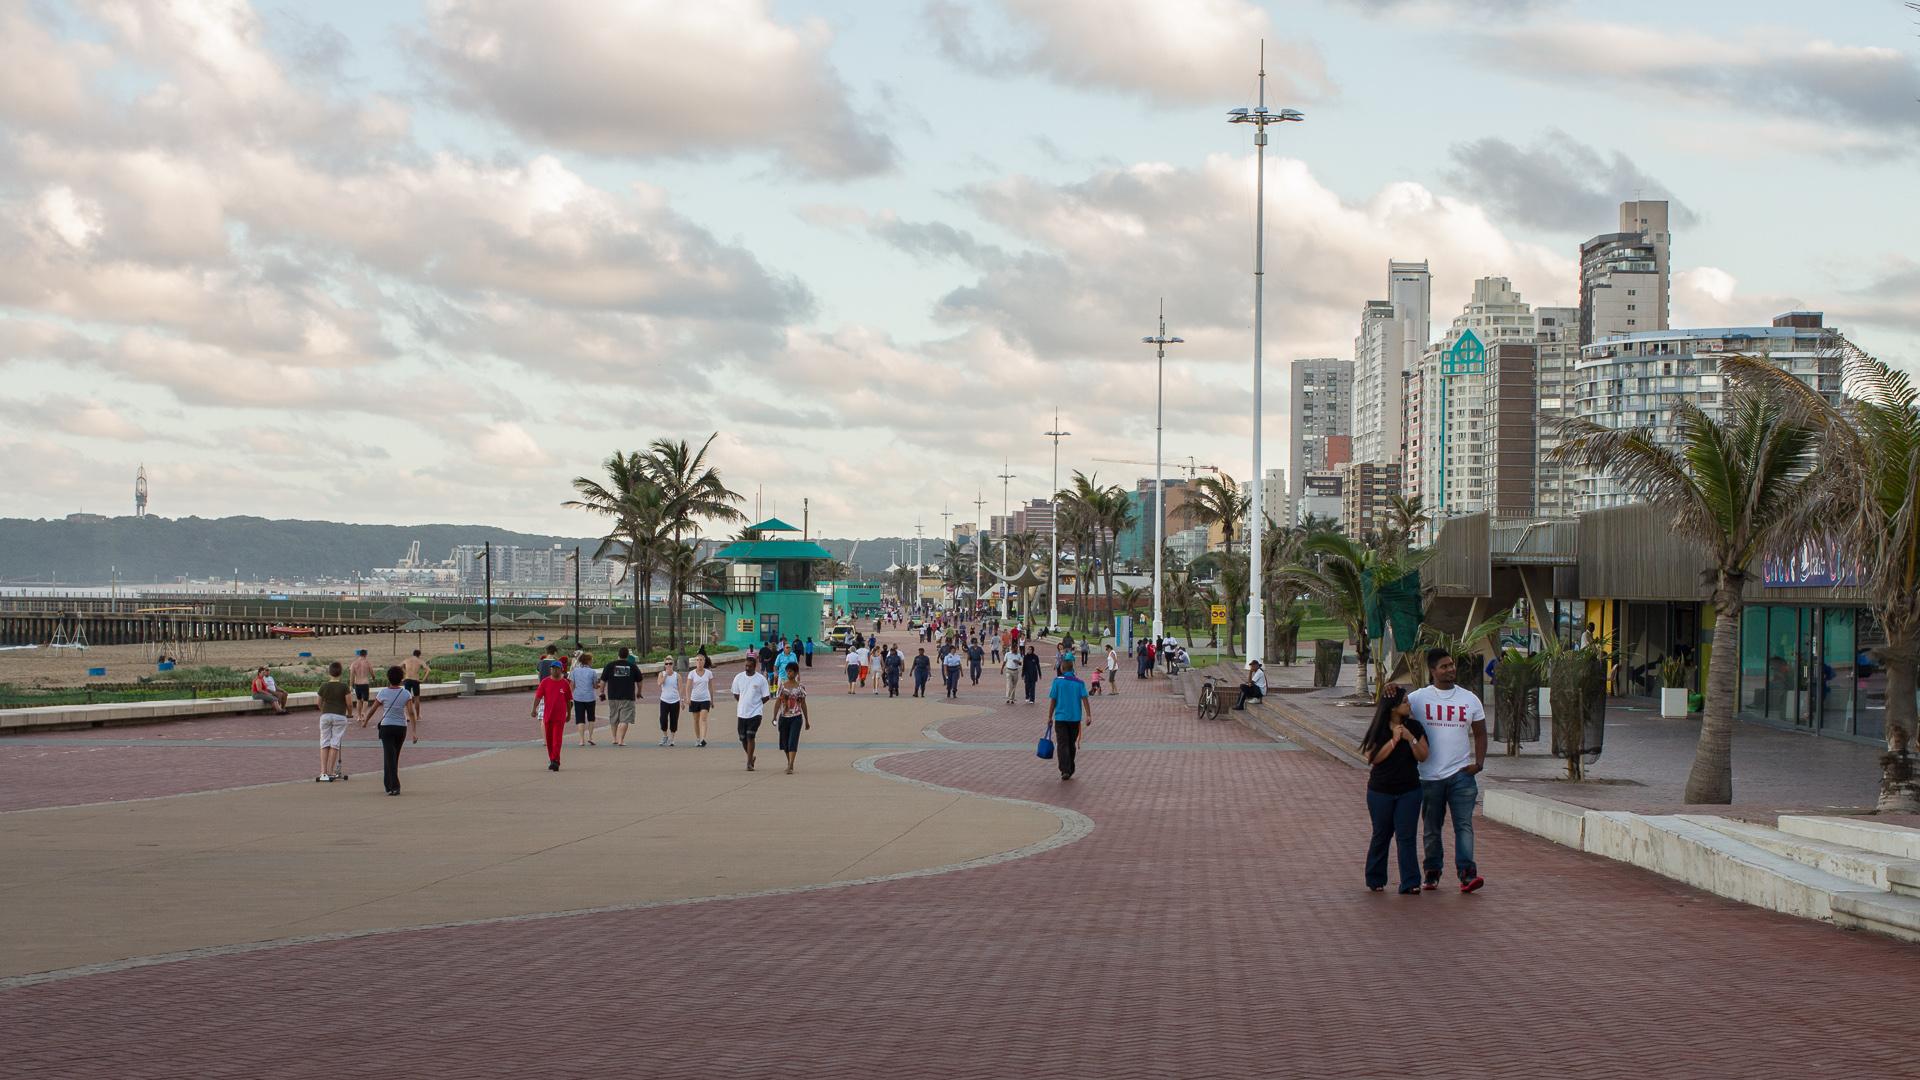 Durban beachfront, 2013